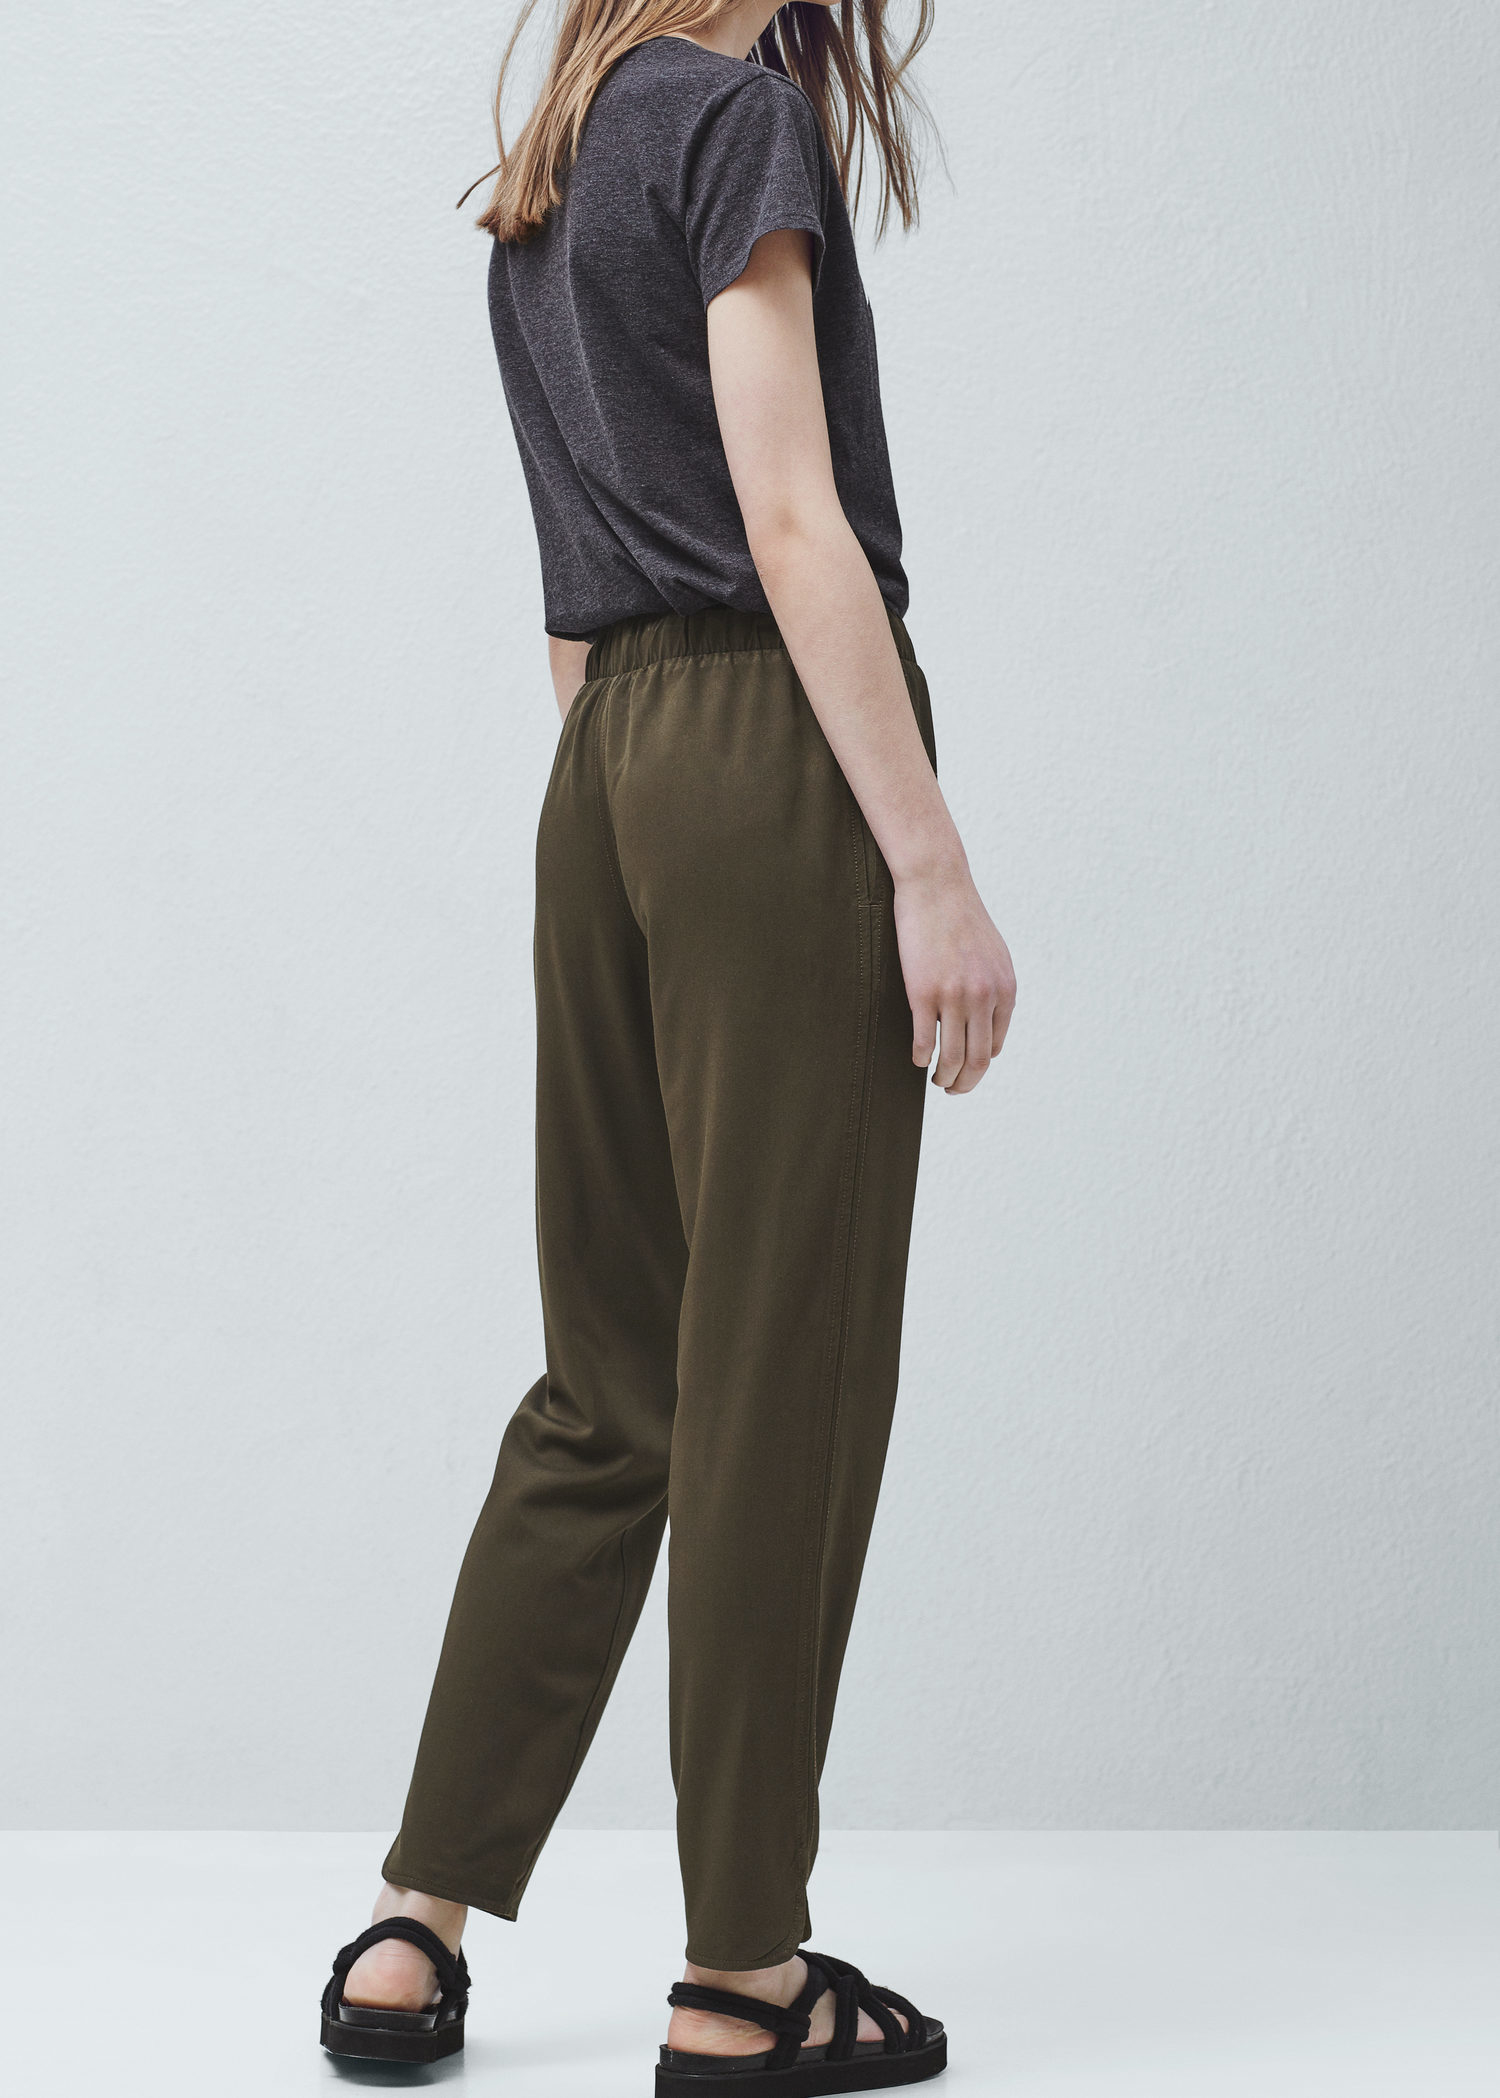 Model  Multipockets Women39s Baggy Cargo Pants Khaki Cargo Pants For Women